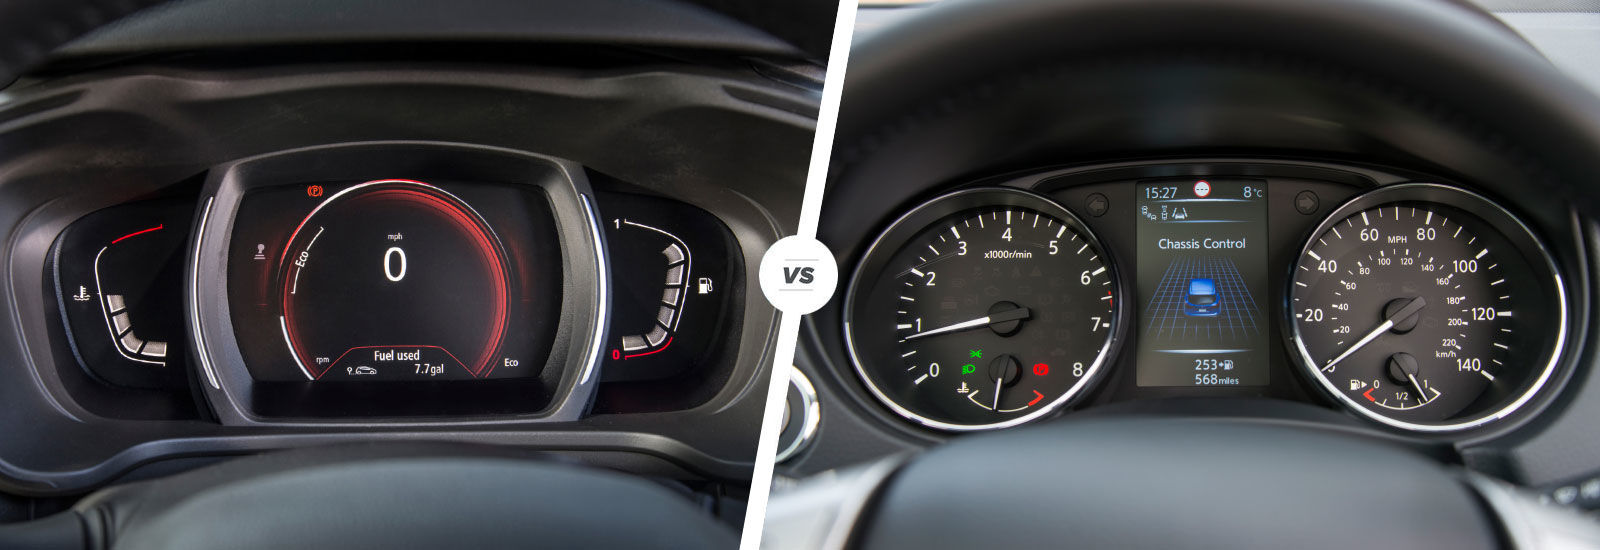 Renault Kadjar vs Nissan Qashqai – which is best?   carwow